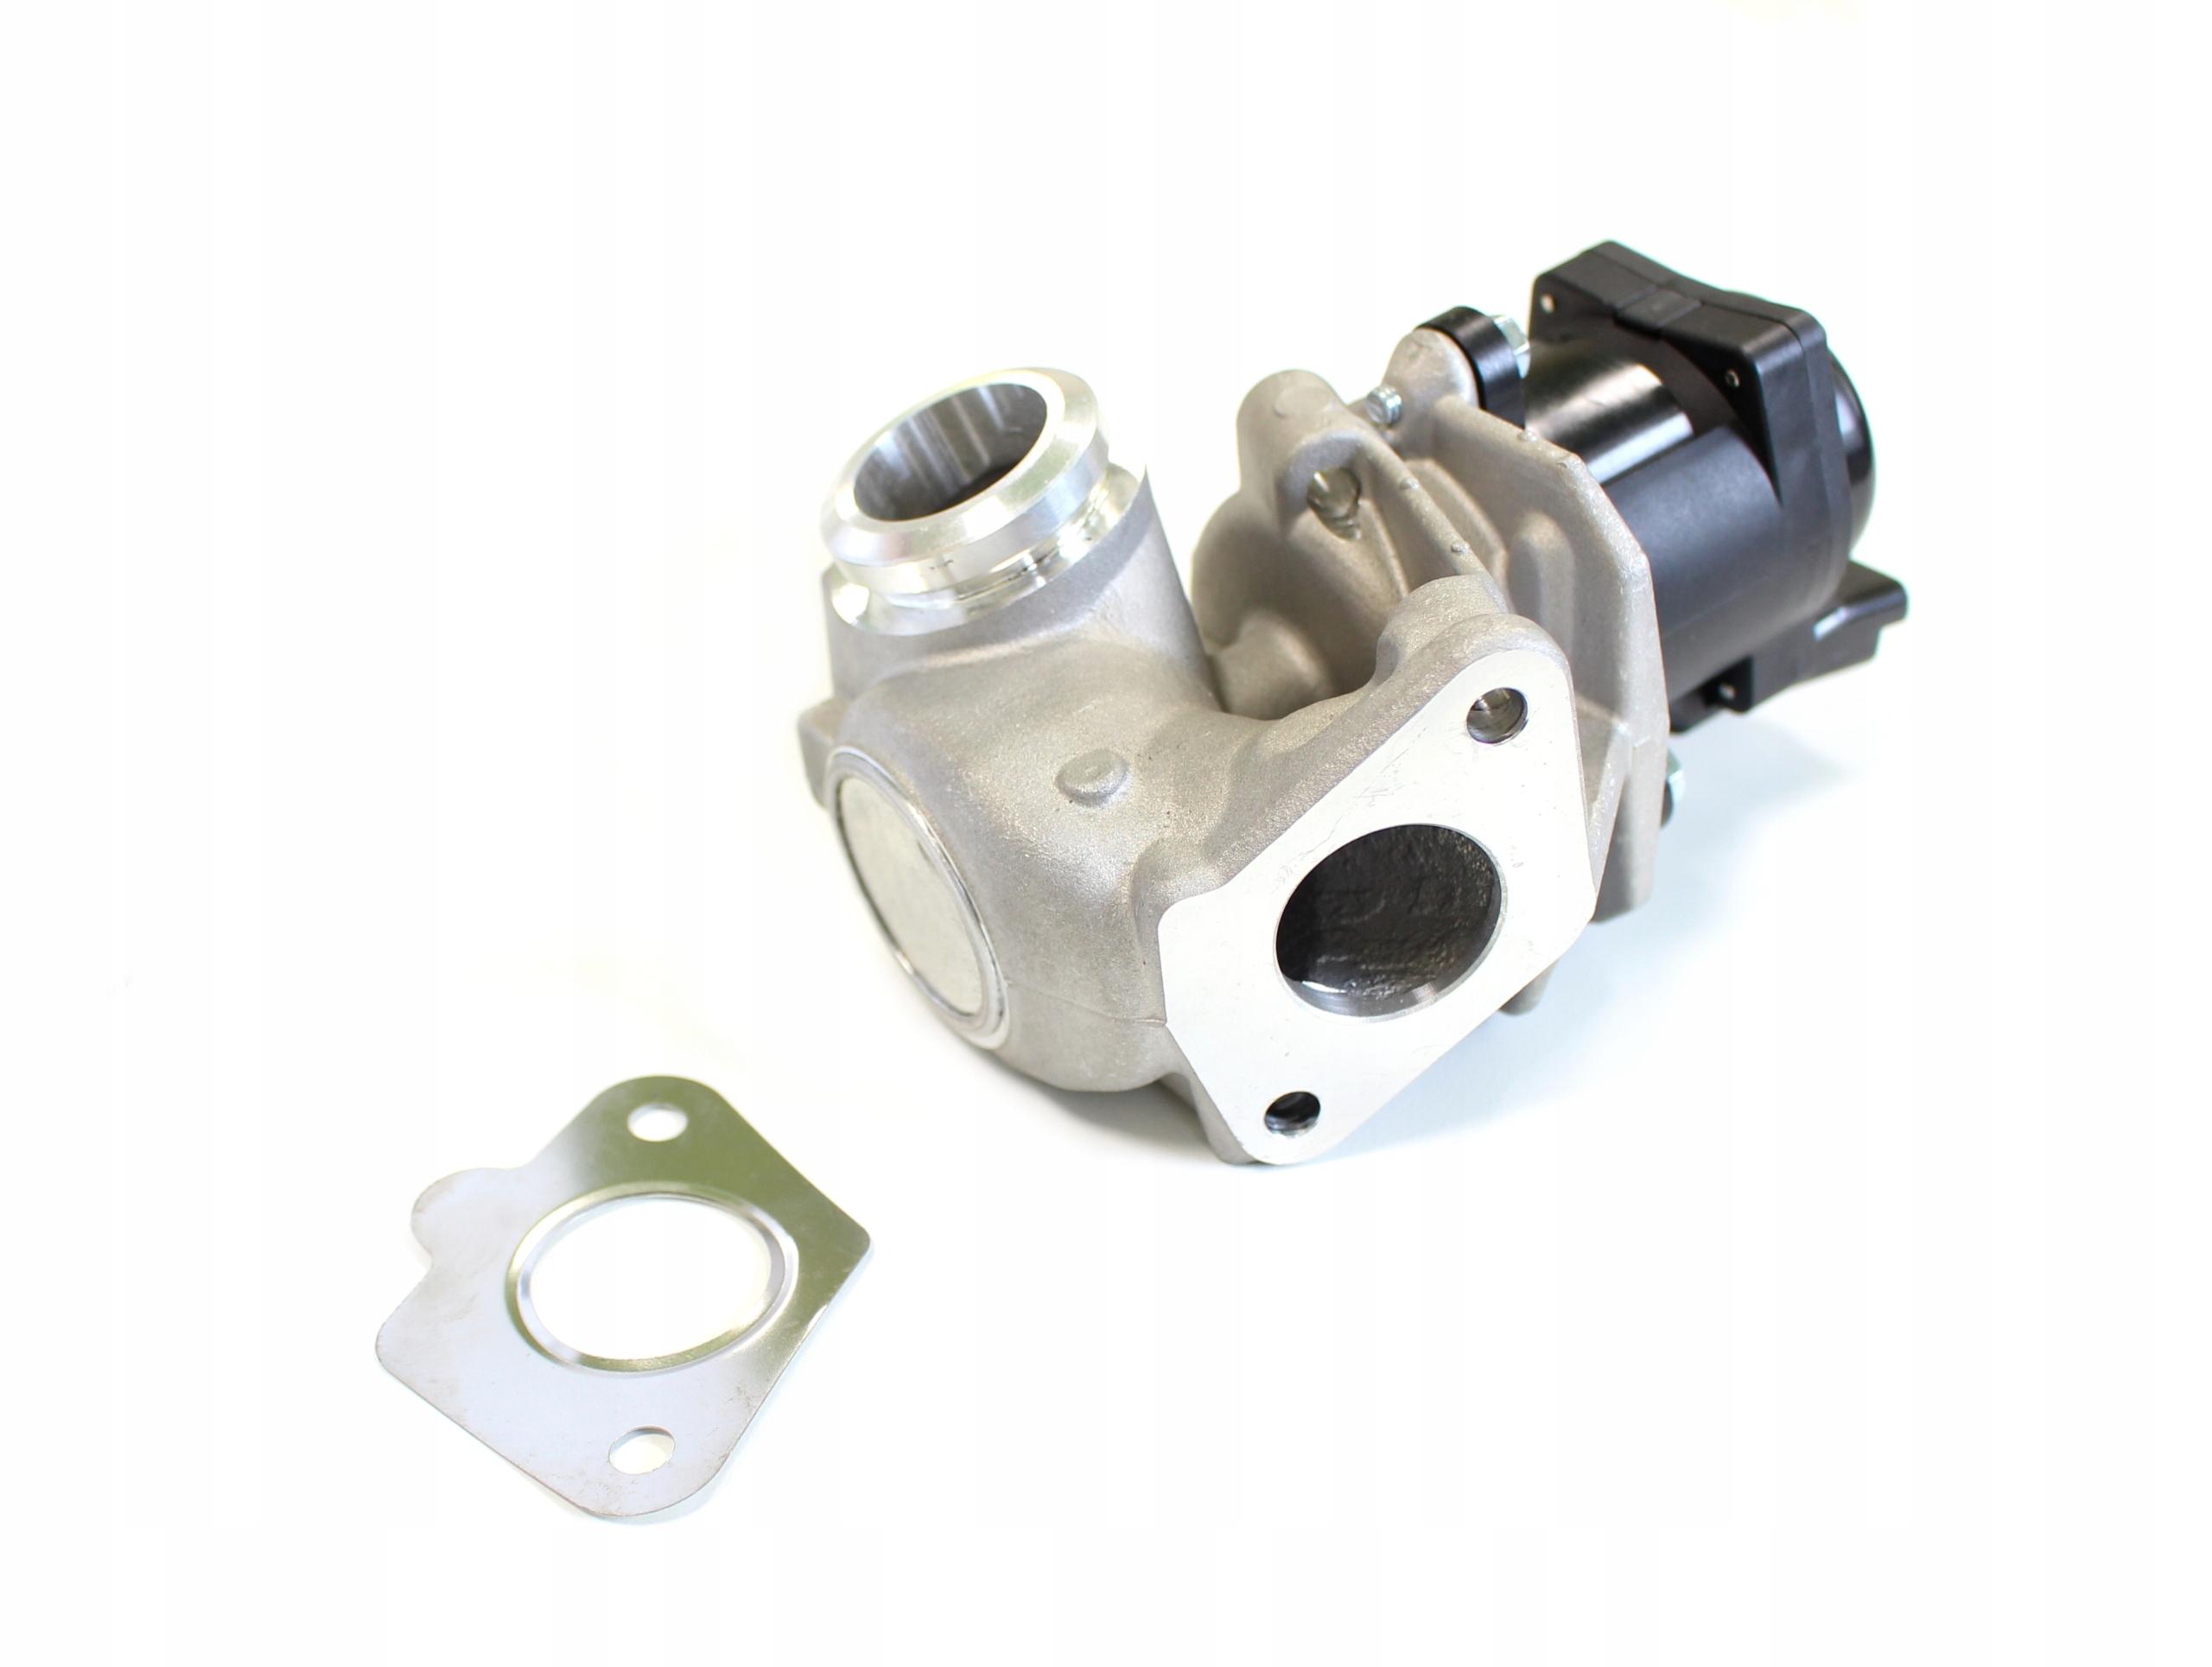 клапан системы рециркуляции ог ford c-max i 1 07-10 16 tdci